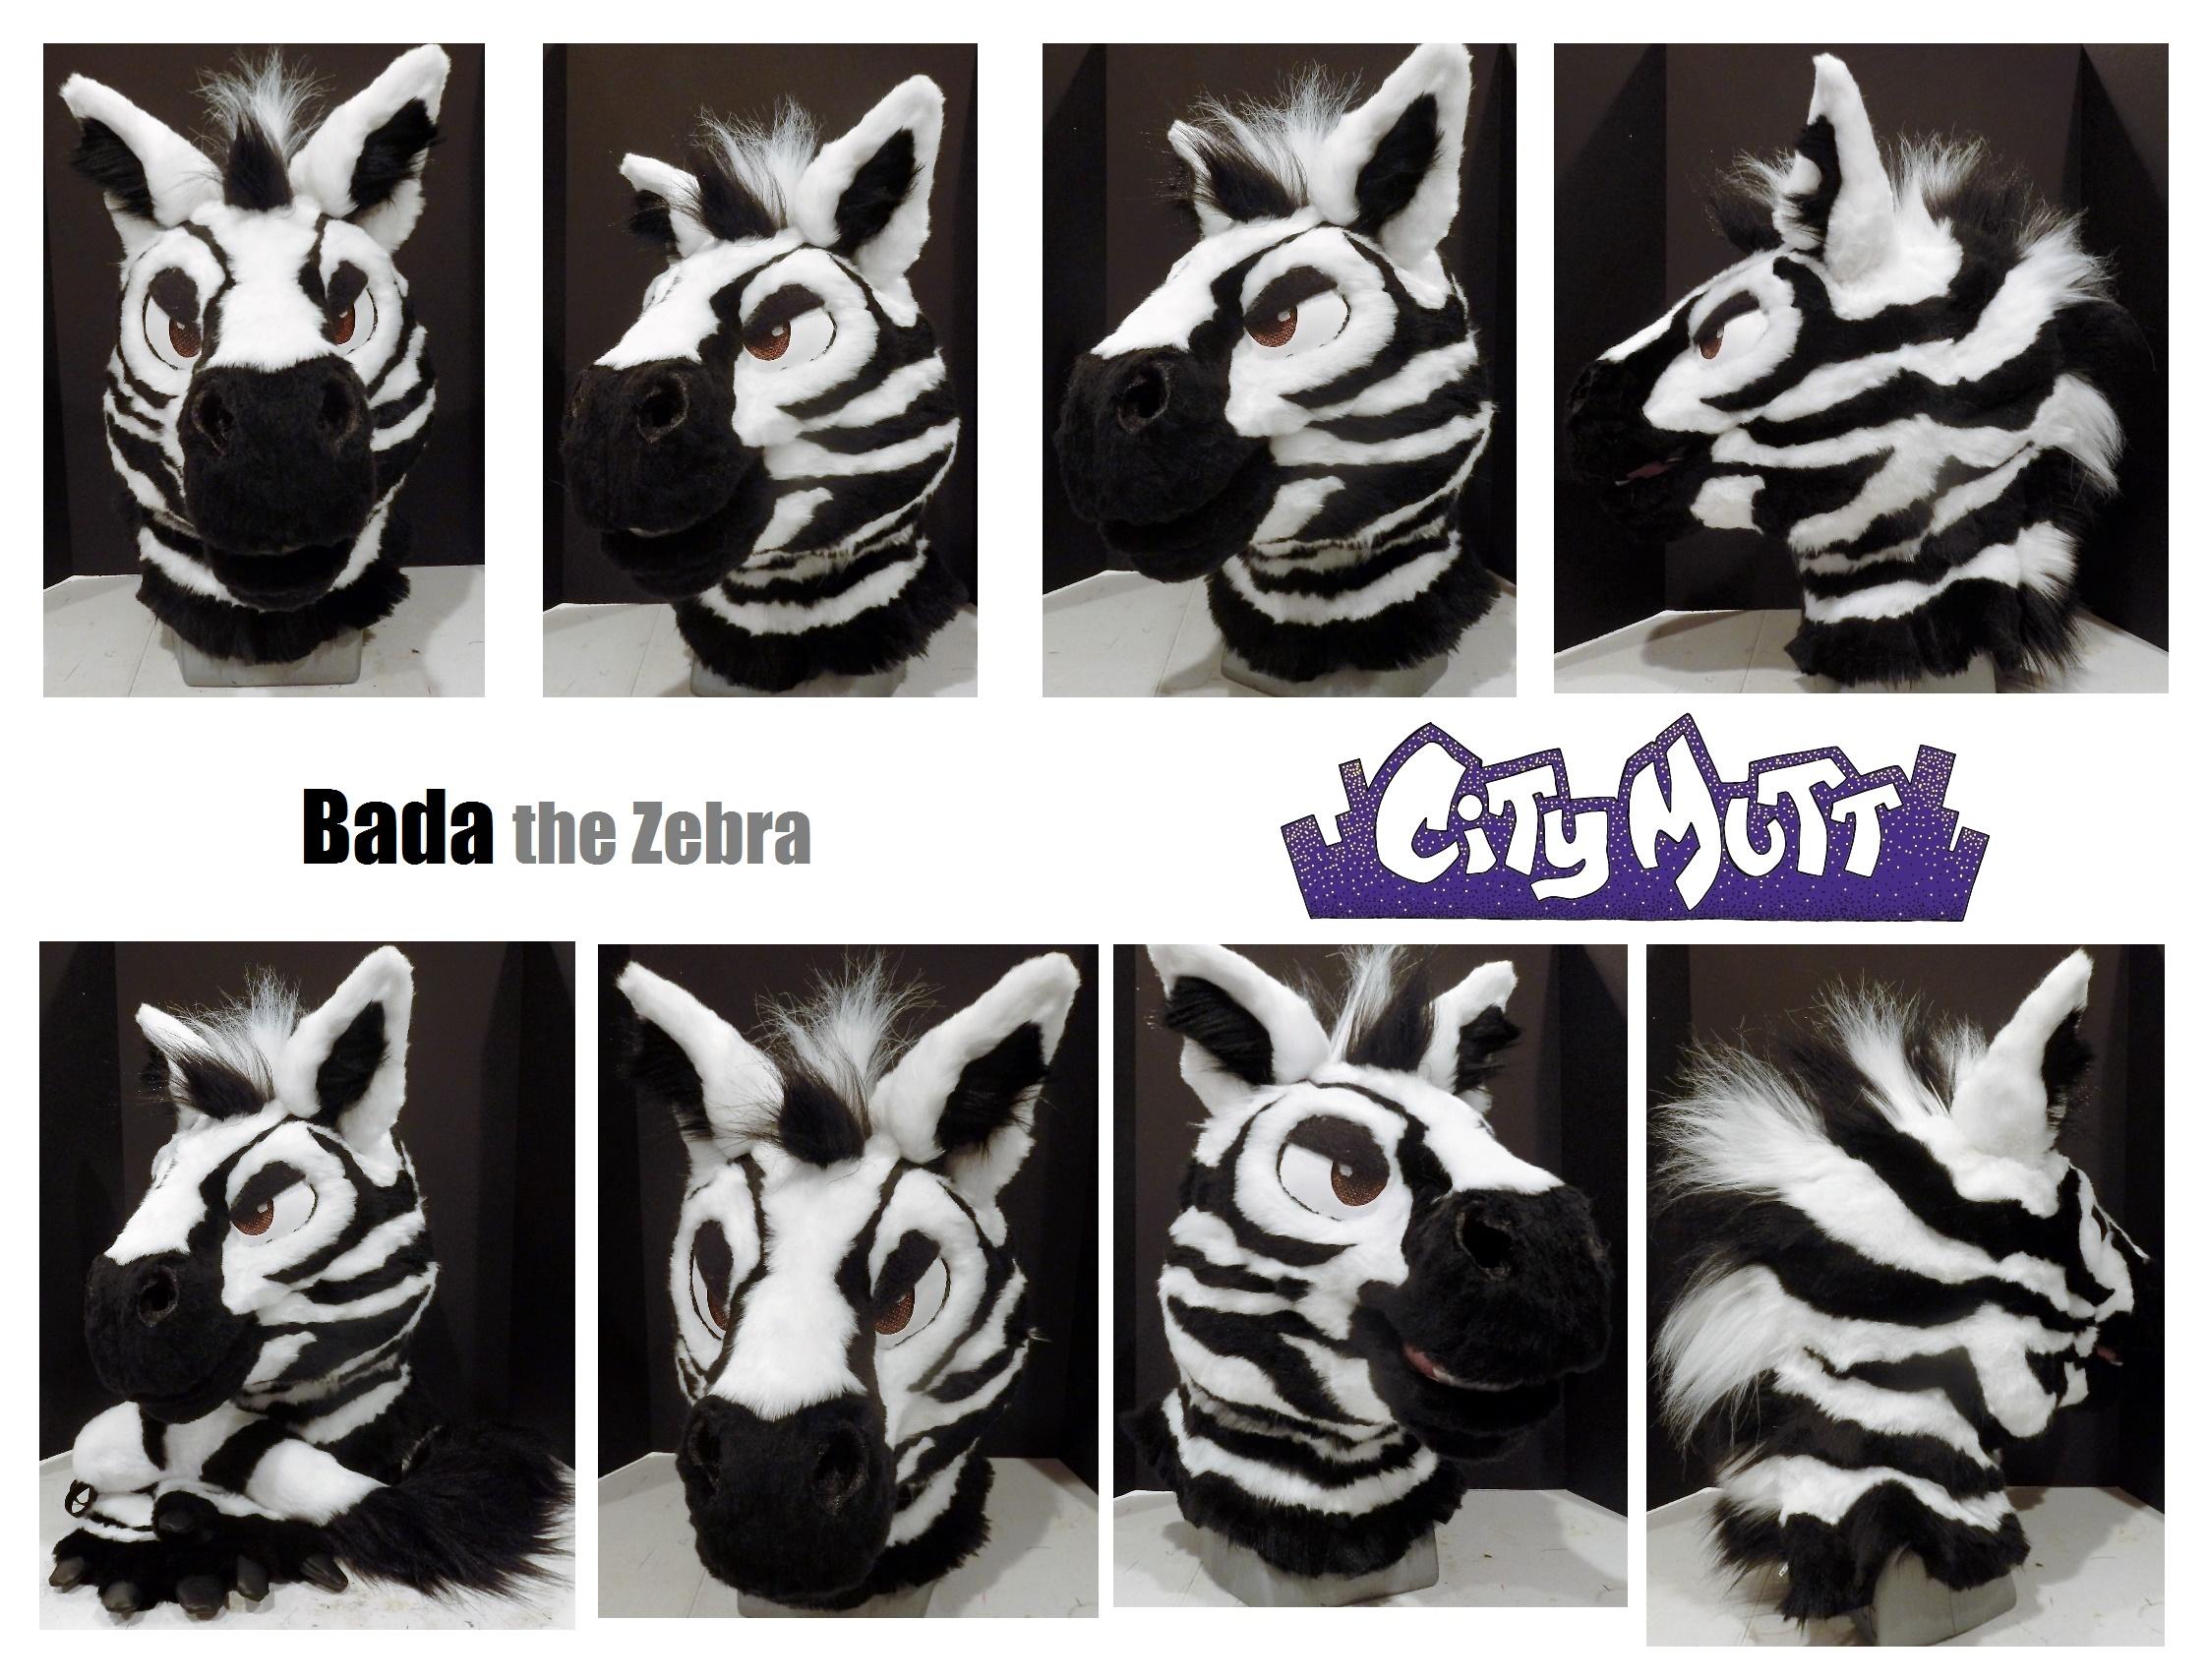 Bada Gallery Sheet.jpg